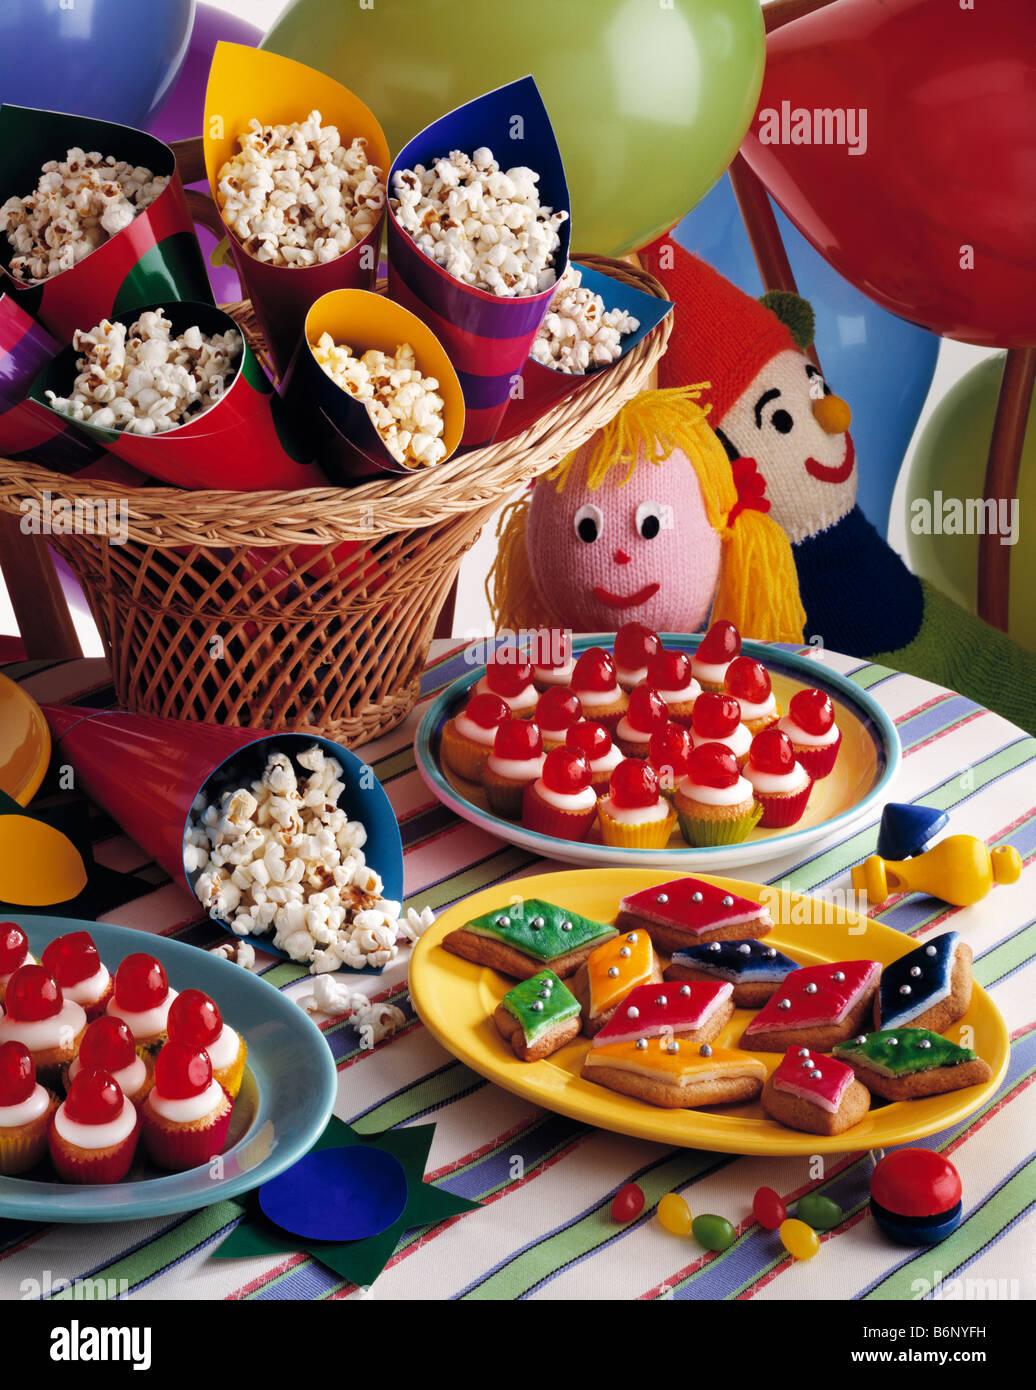 Kids Party Essen Popcorn Und Cupcakes Stockfoto Bild 21380901 Alamy